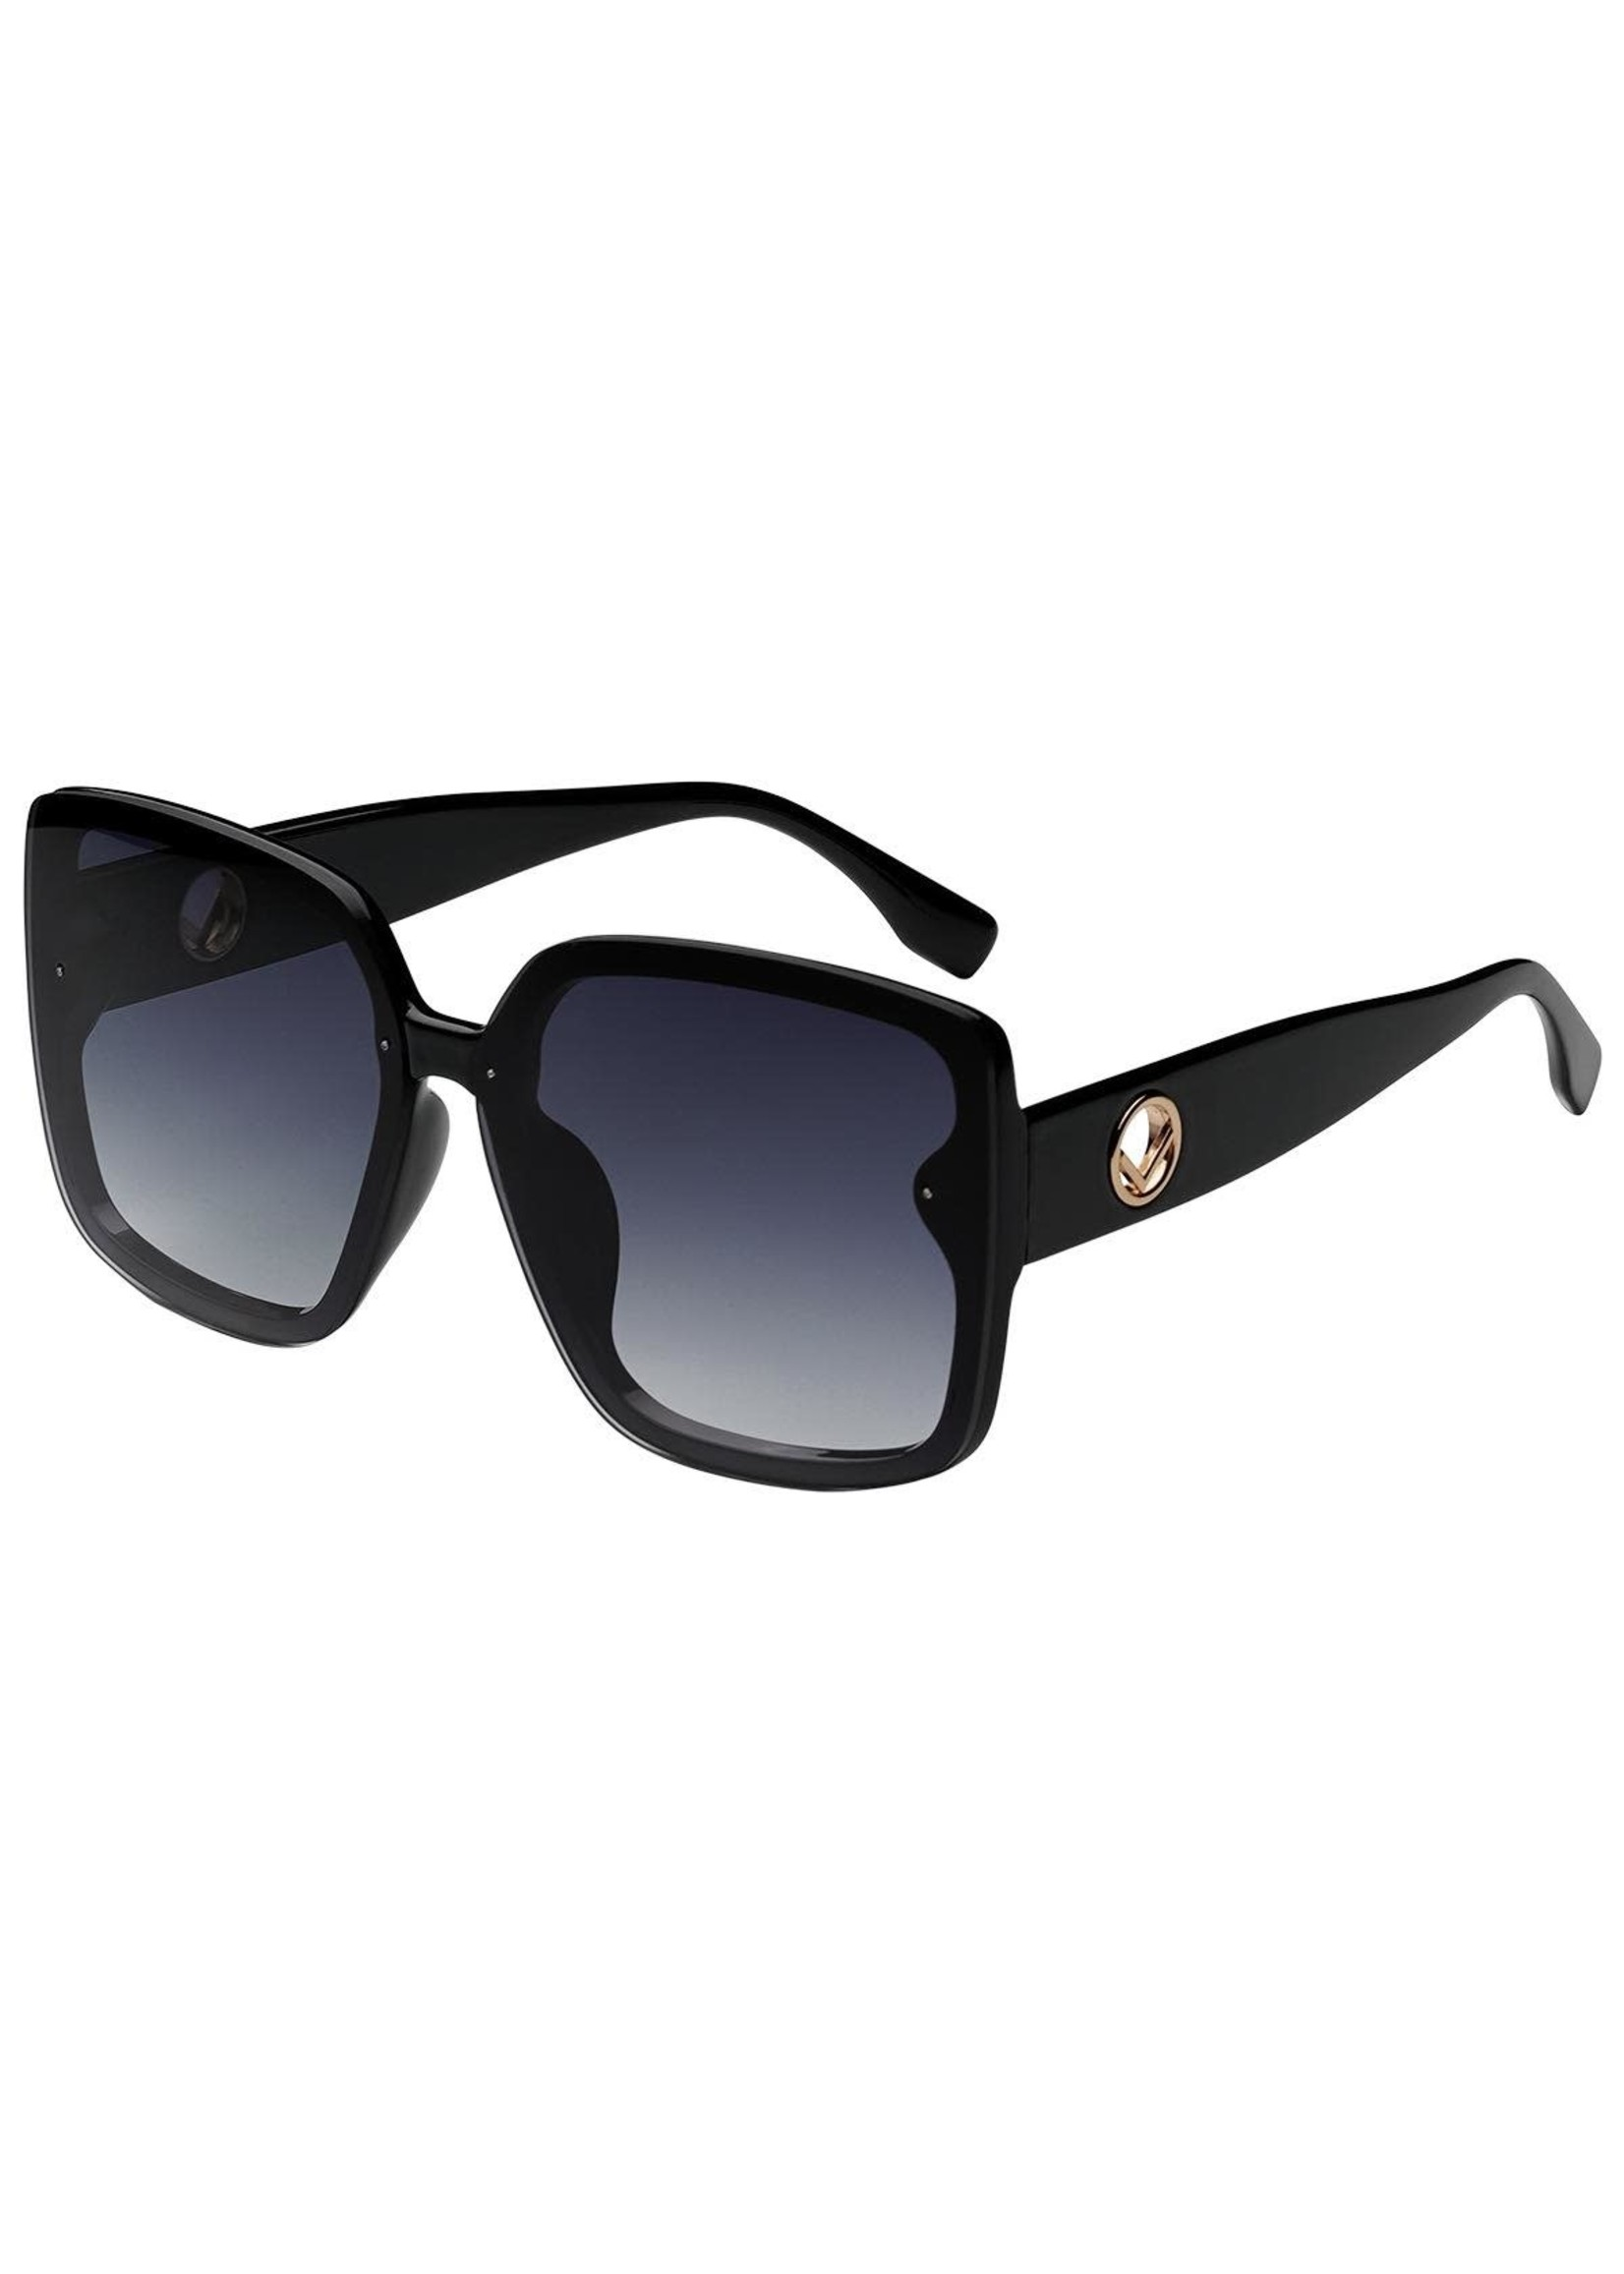 Rome Sunglasses Black